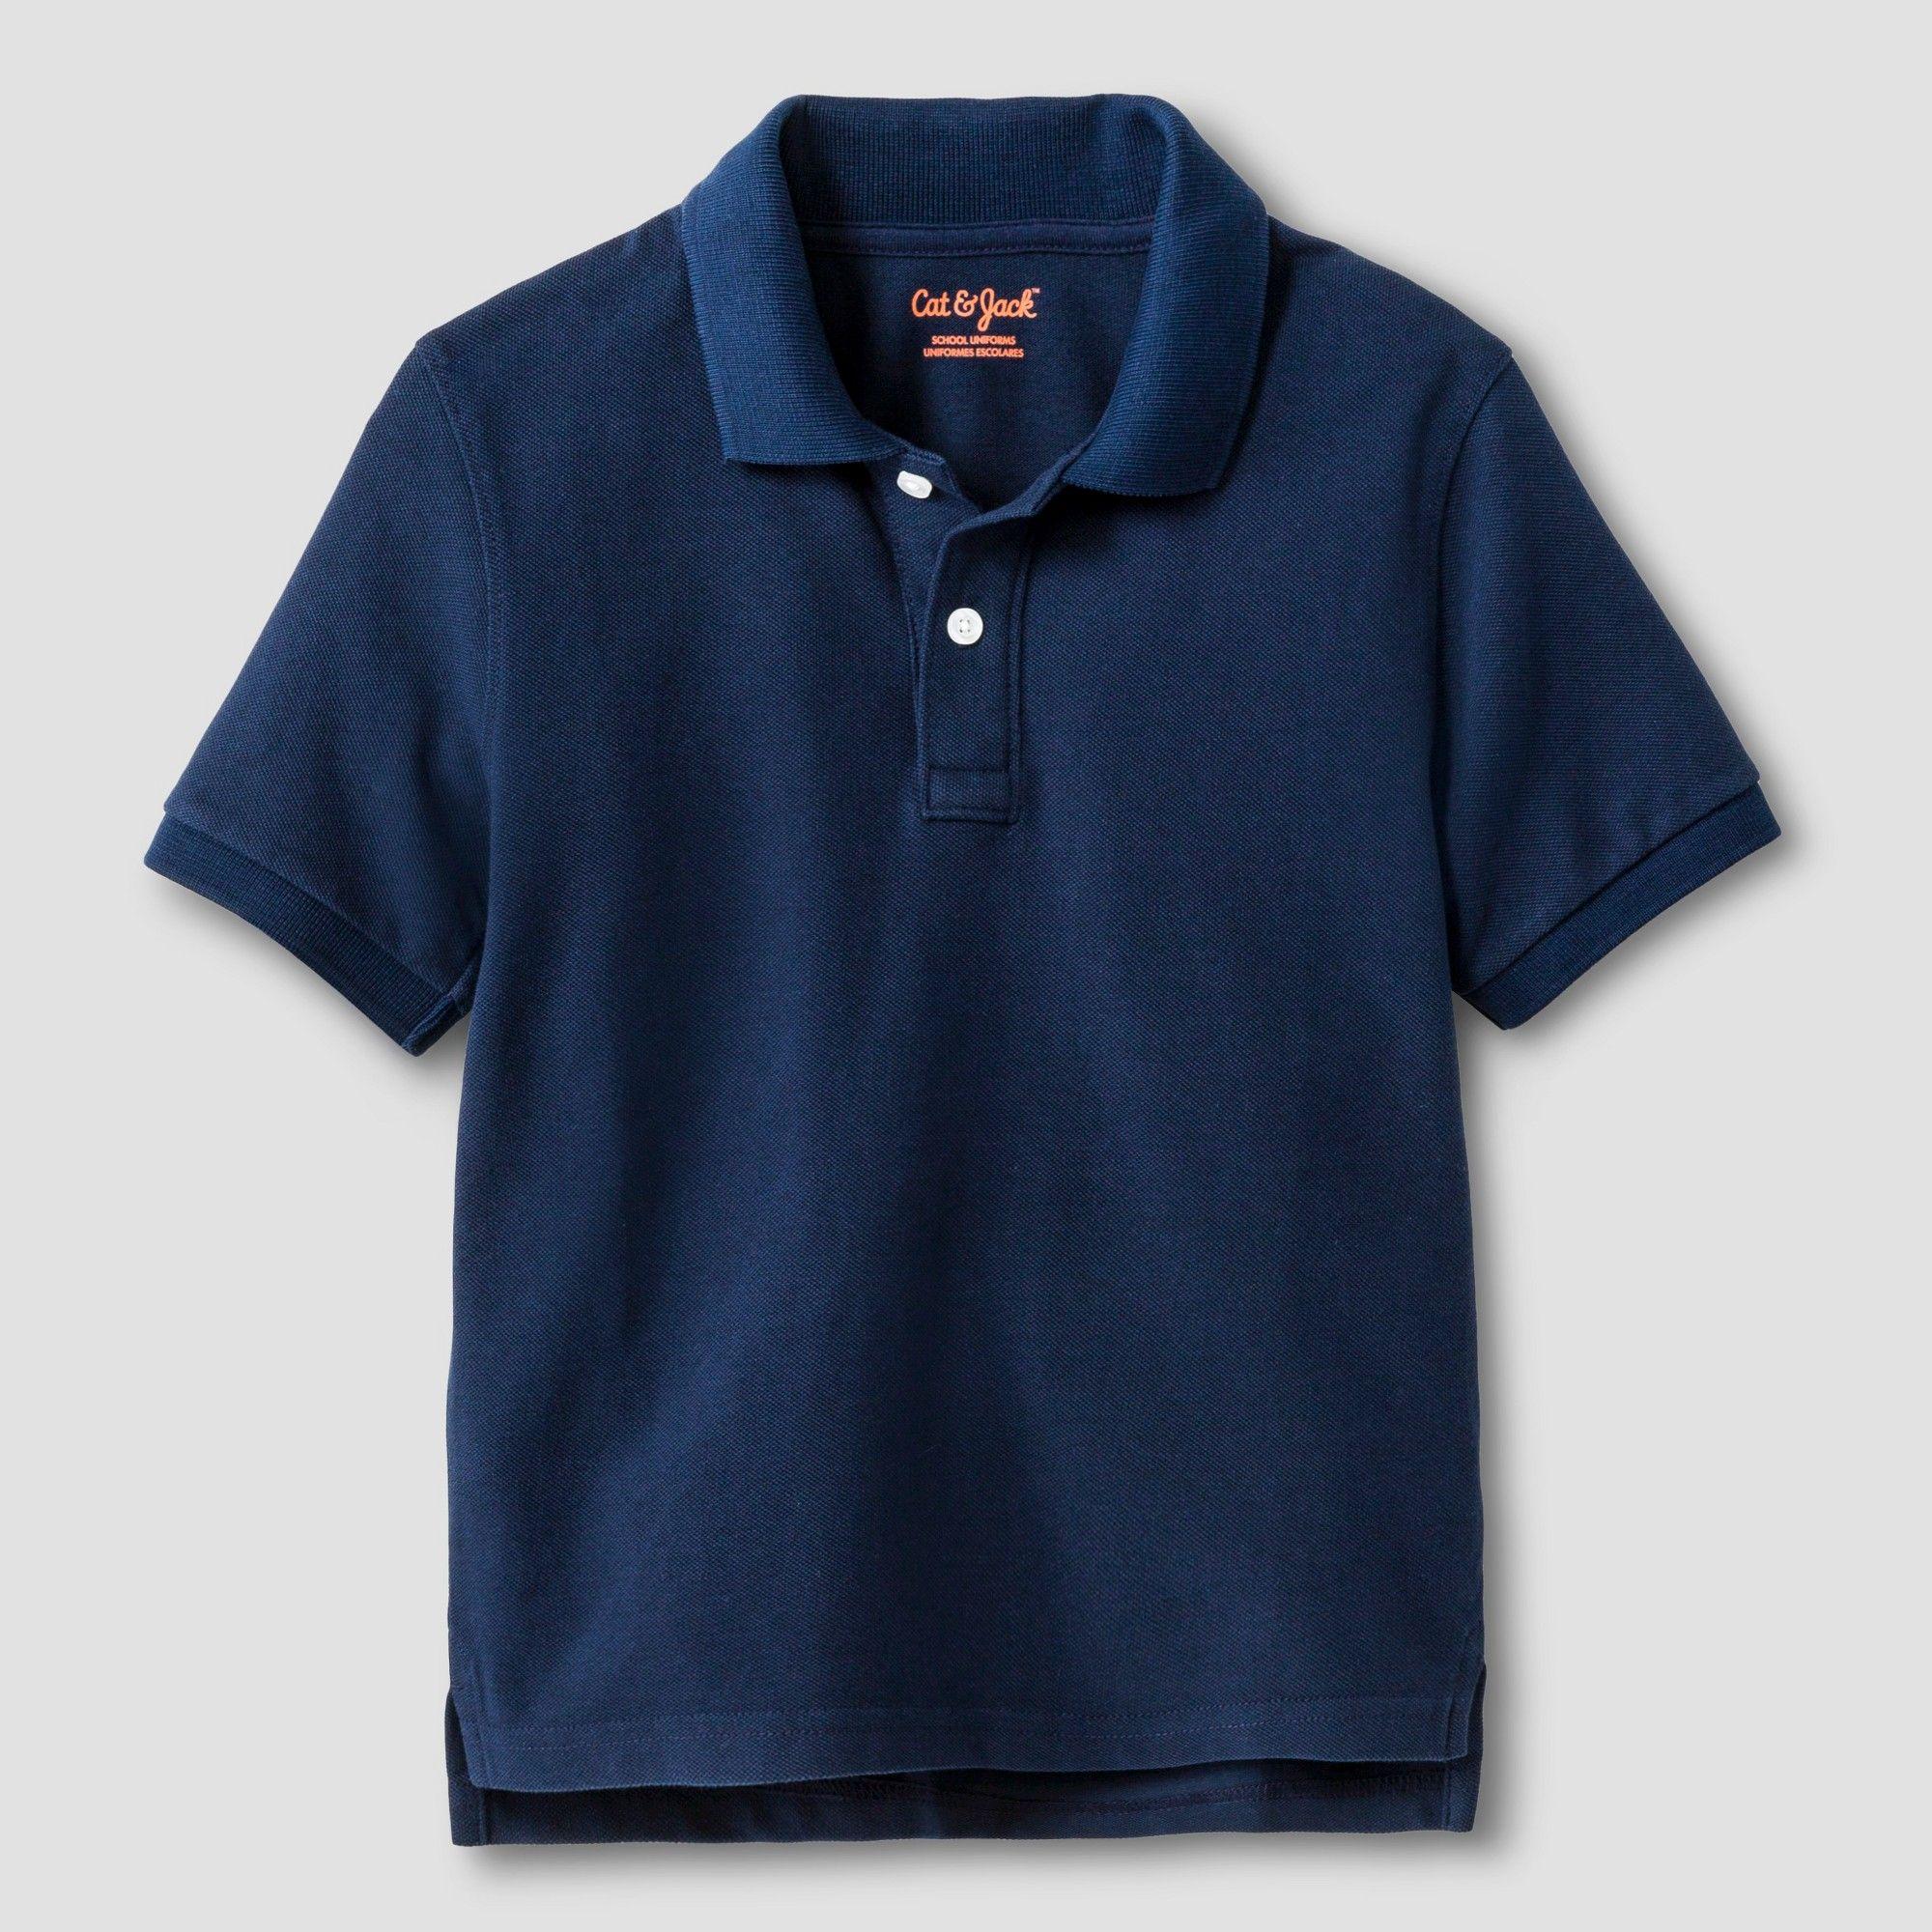 0bb0a2e26 Toddler Boys' Short Sleeve Pique Polo Shirt - Cat & Jack Navy (Blue) T,  Size: 3T